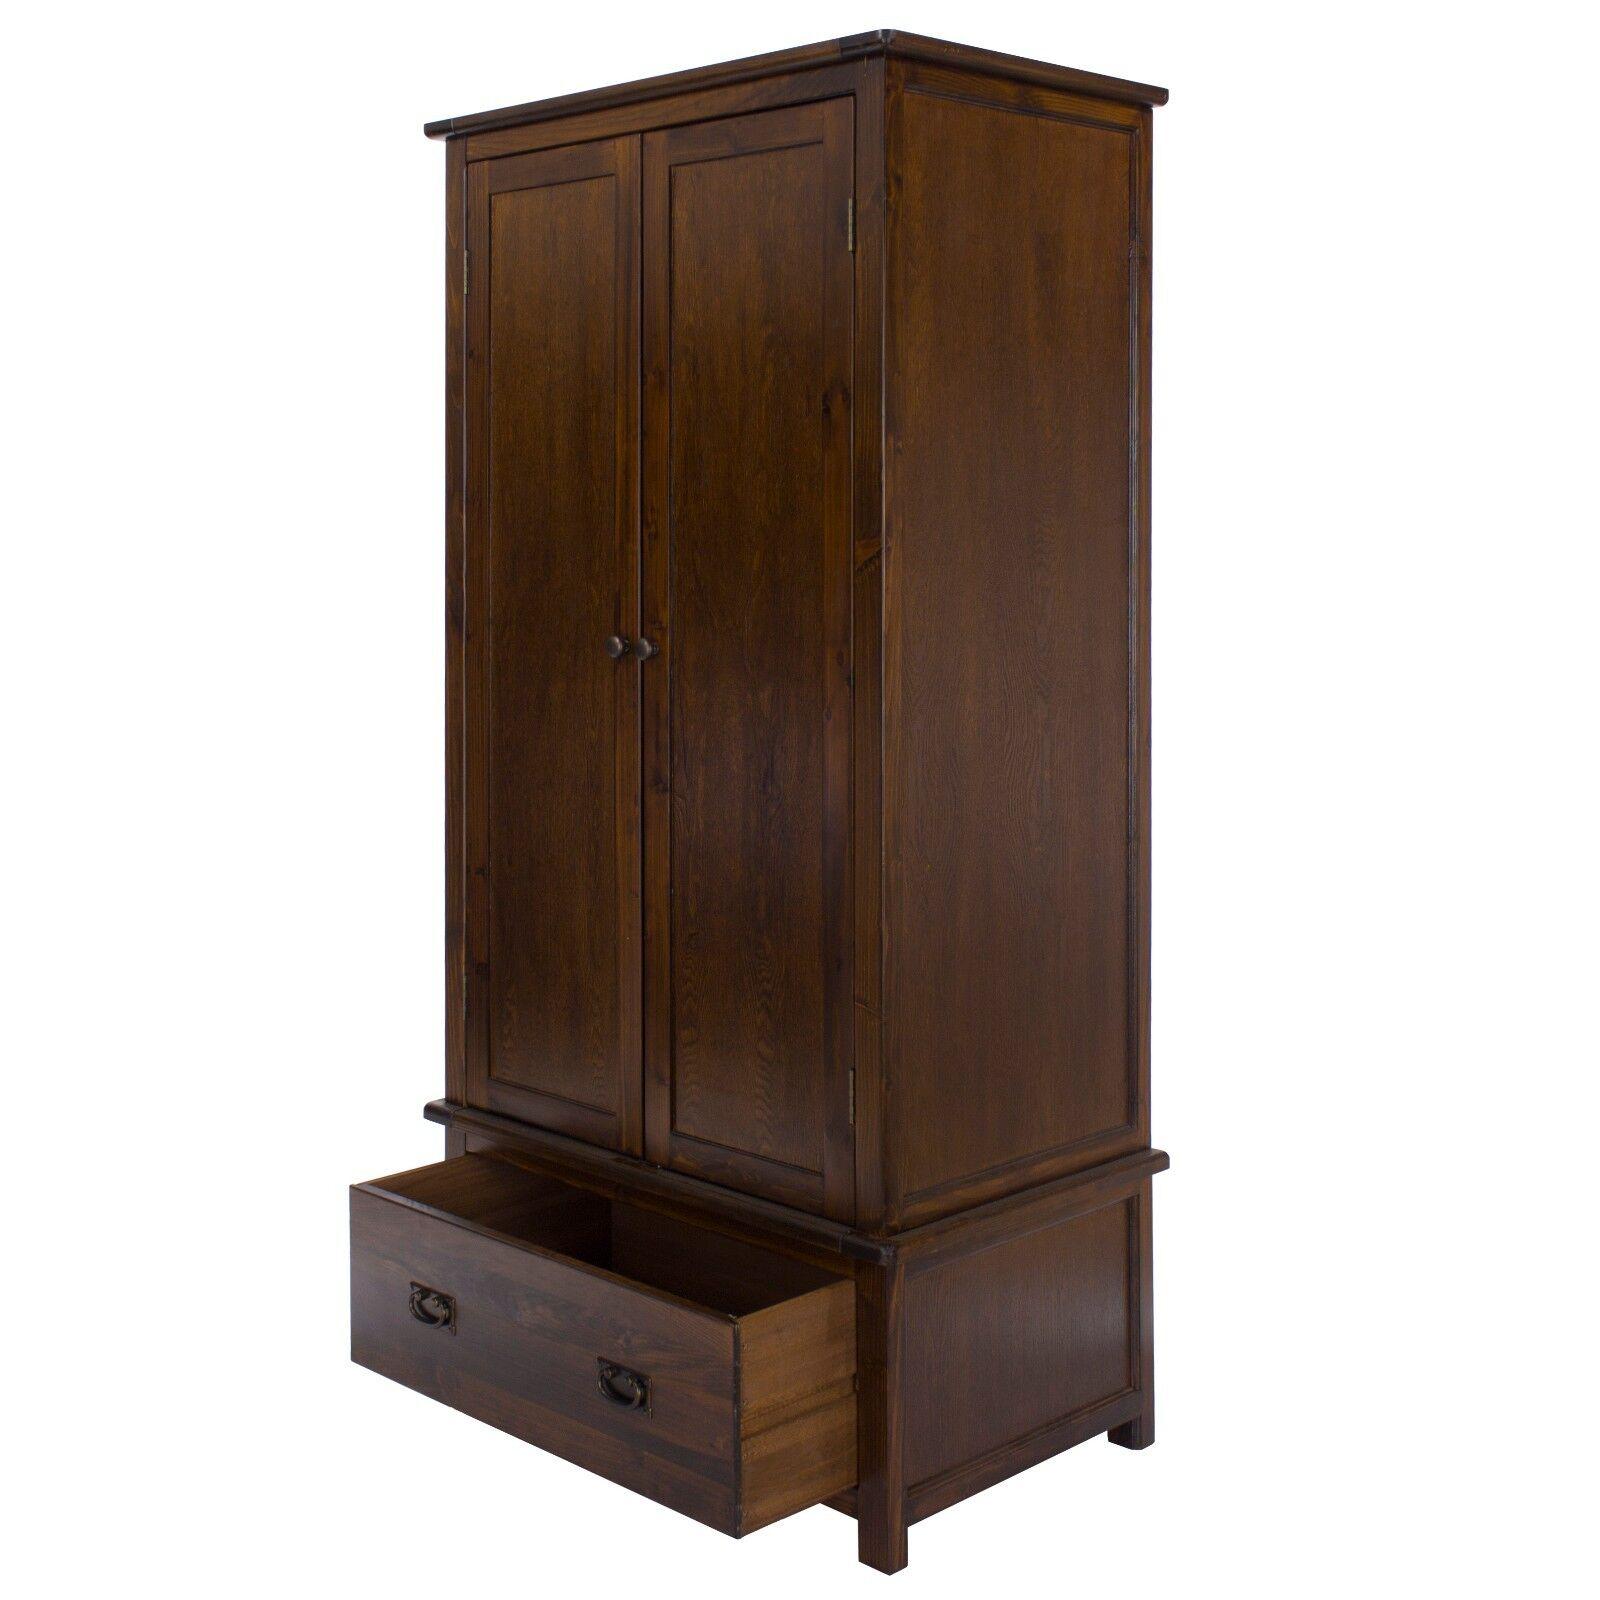 Baltia Dark Wood 2 Door 1 Drawer Wardrobe Solid Wood Bedroom Hanging Rail Ebay